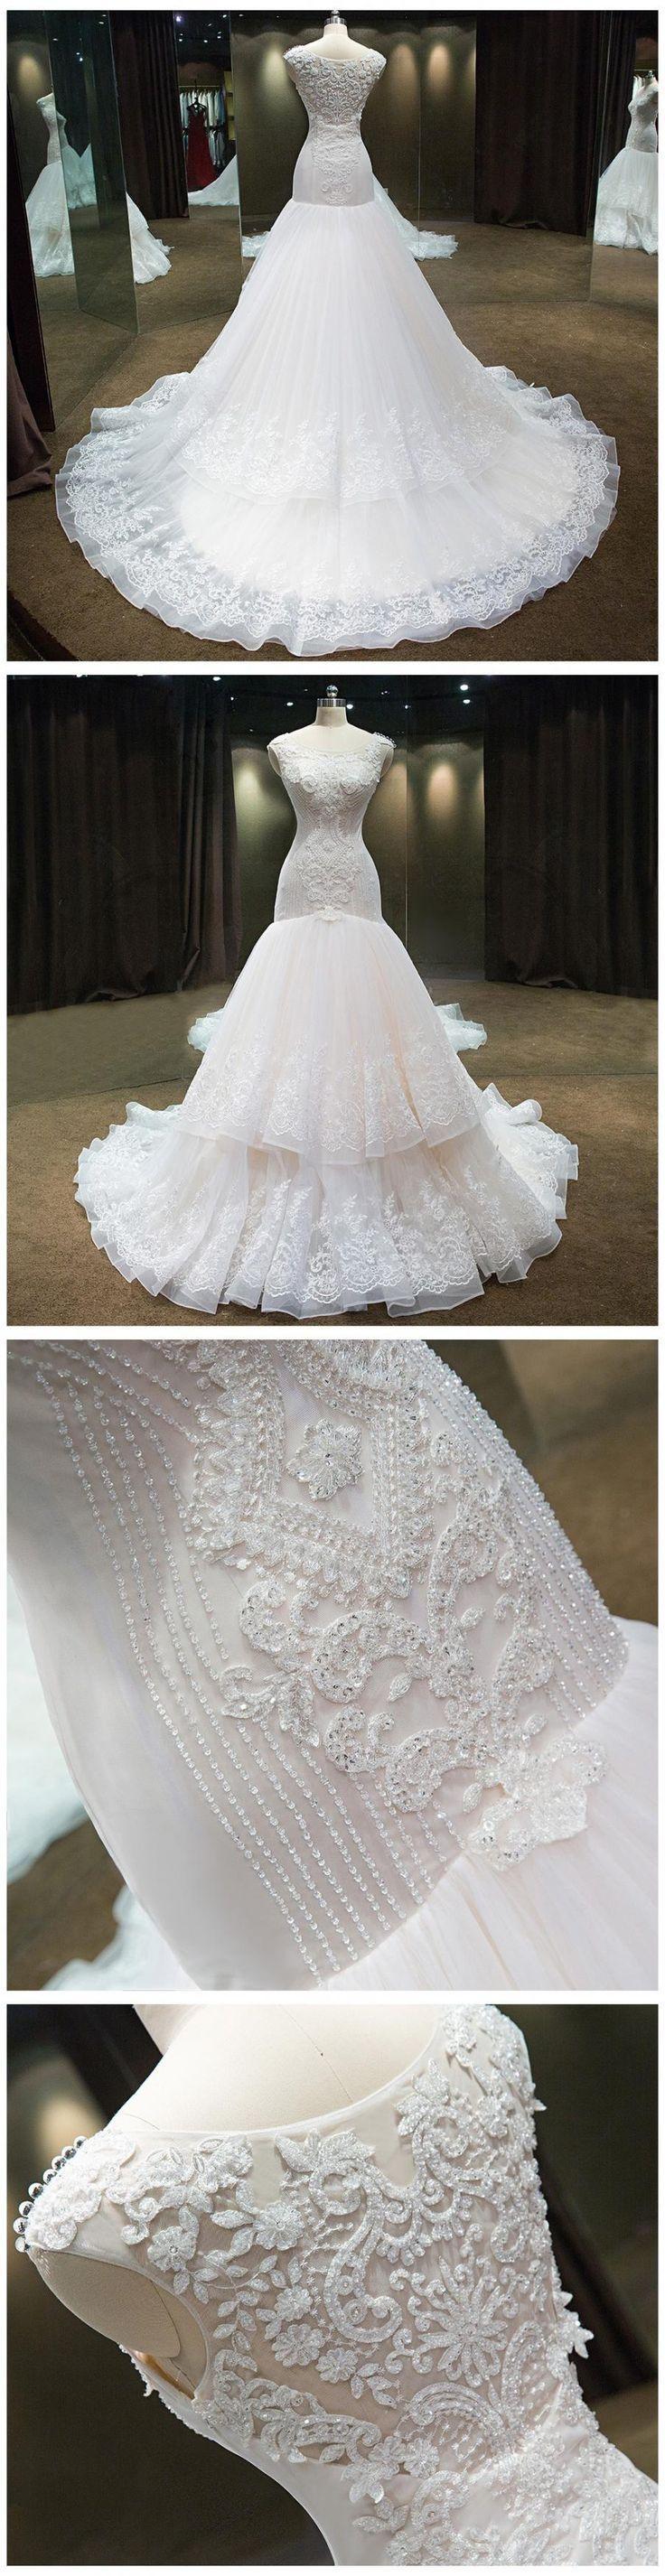 Wedding - Luxury Mermaid Wedding Dress With C